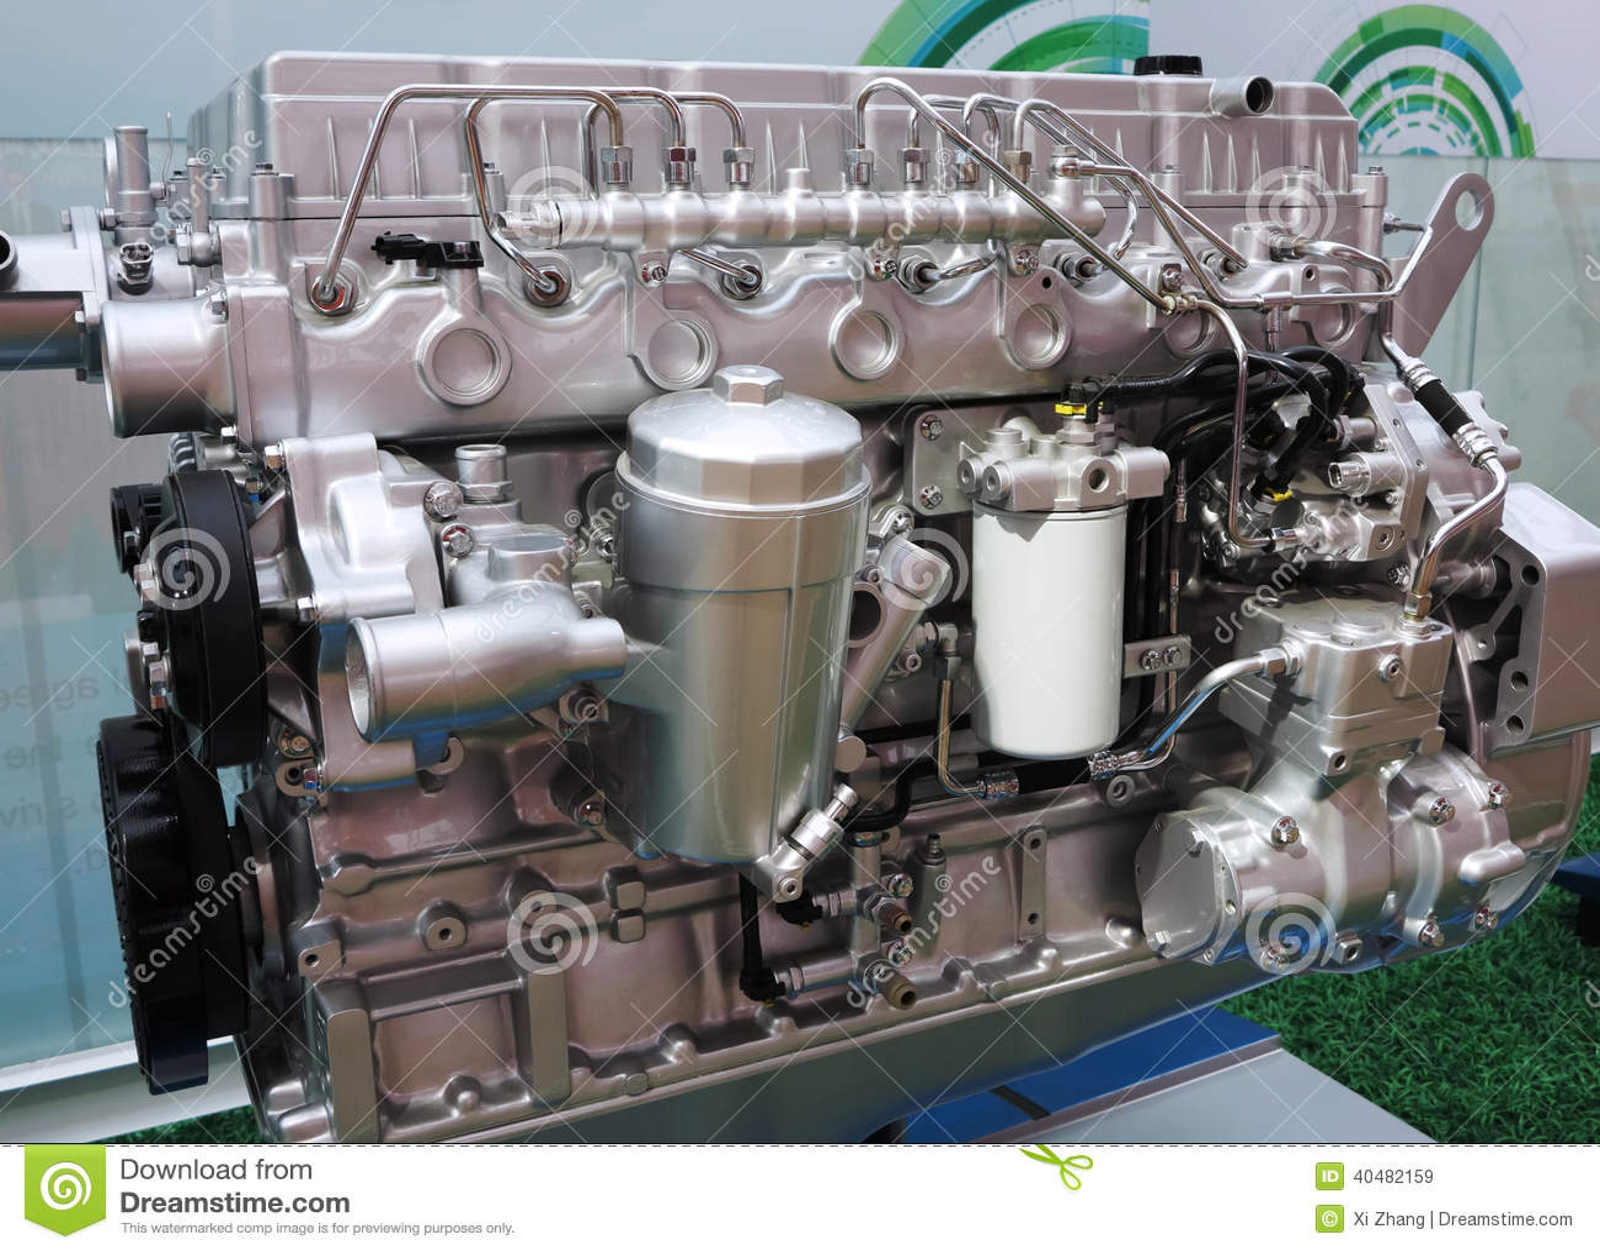 Motorcykelbensin tankade motorn